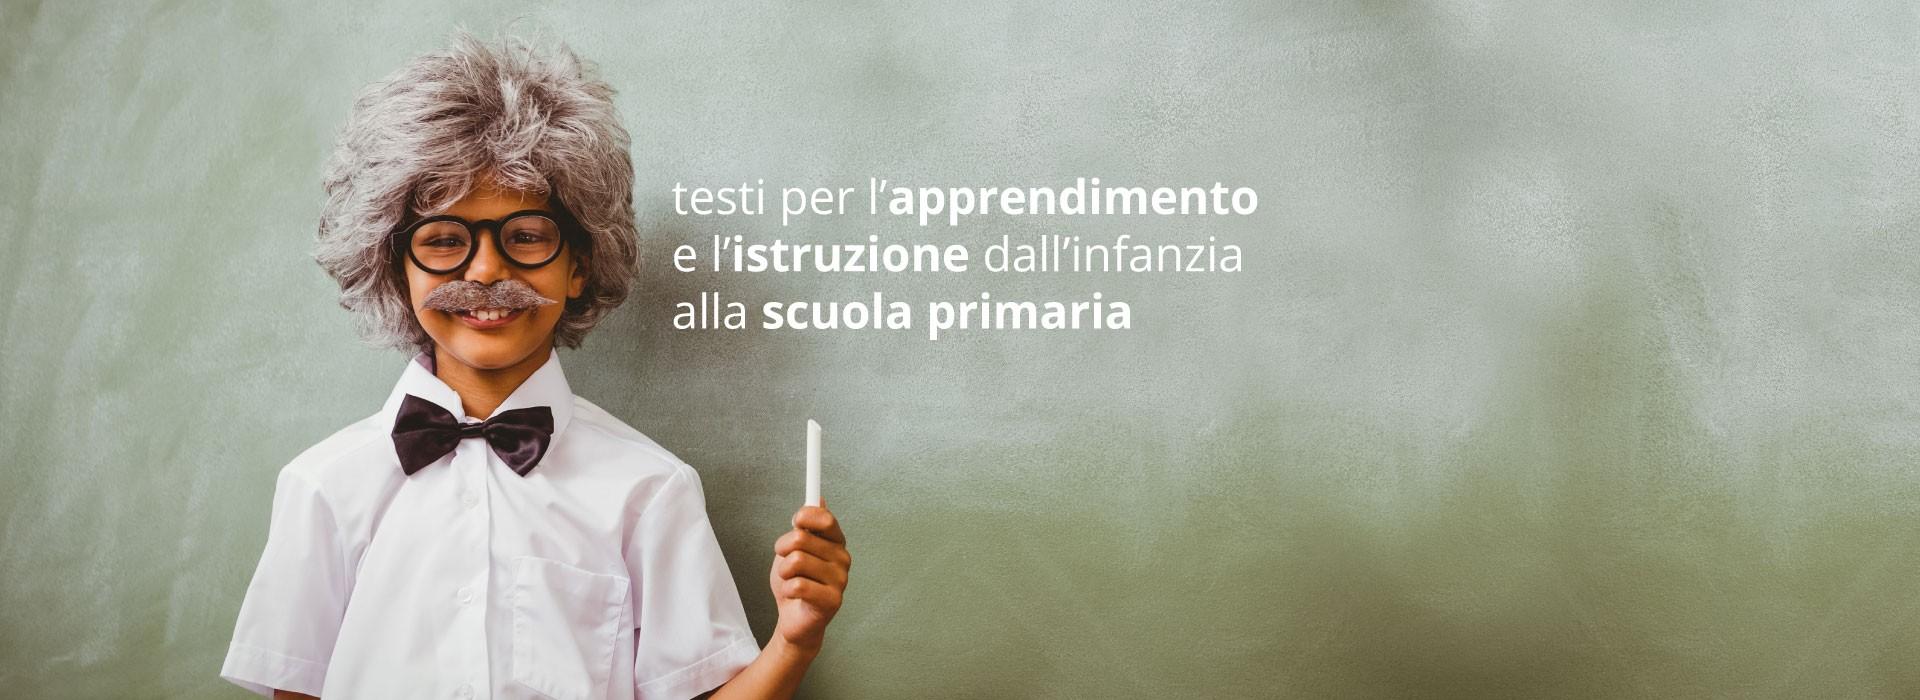 bifulco-libri-slide-04